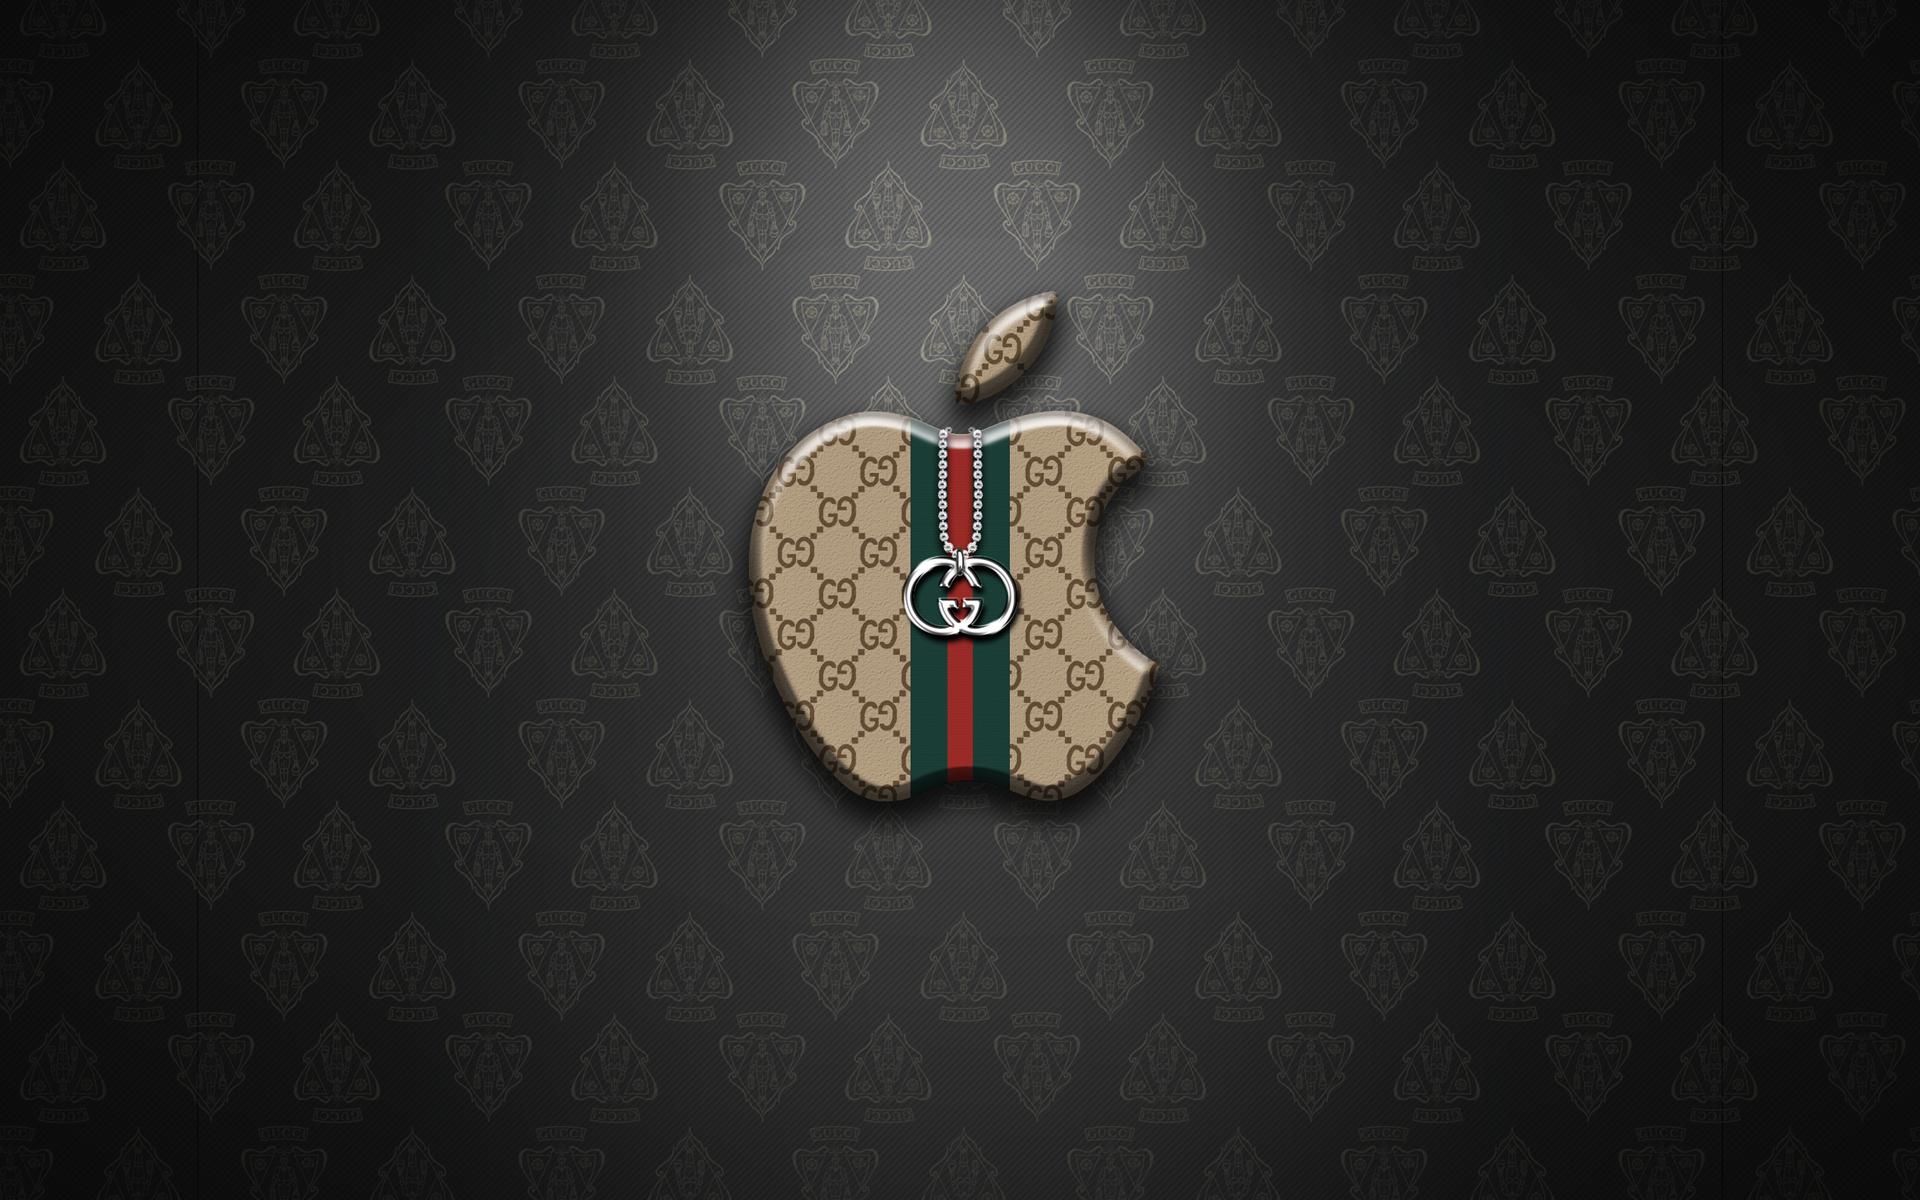 Gucci wallpaper 181106 1920x1200